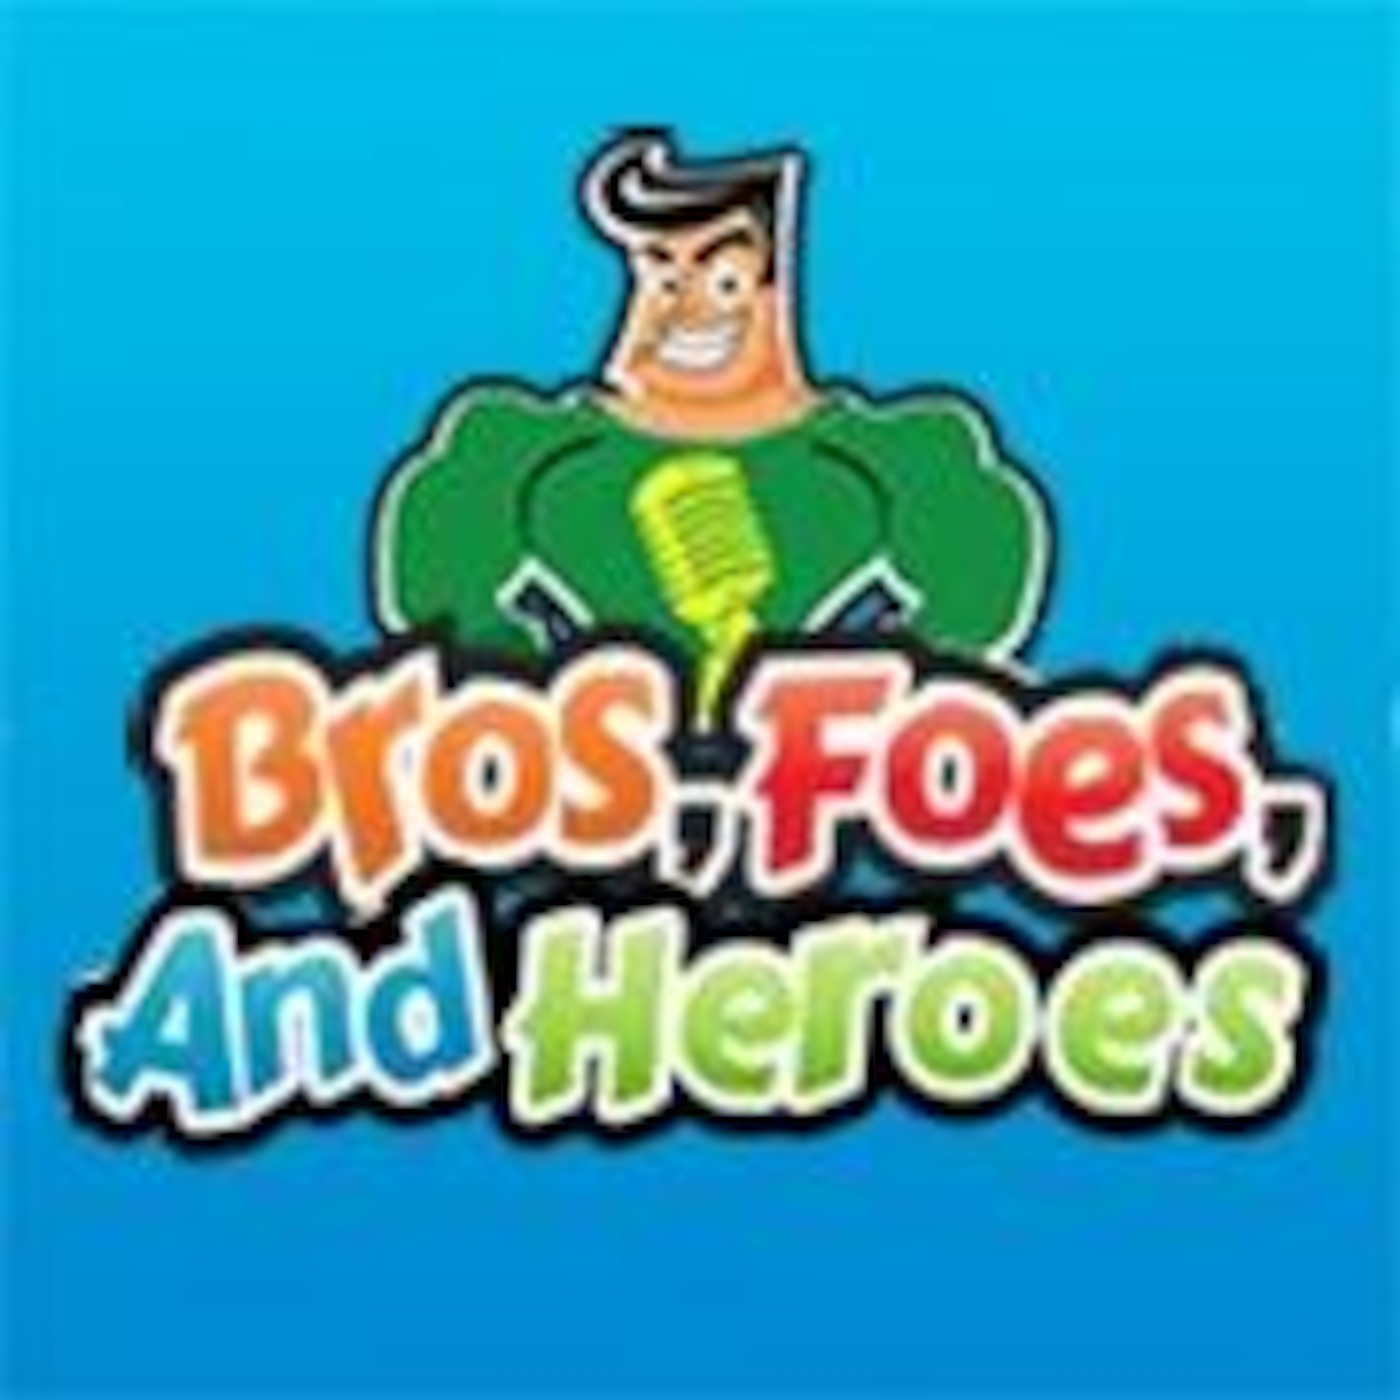 Bros, Foes, And Heroes